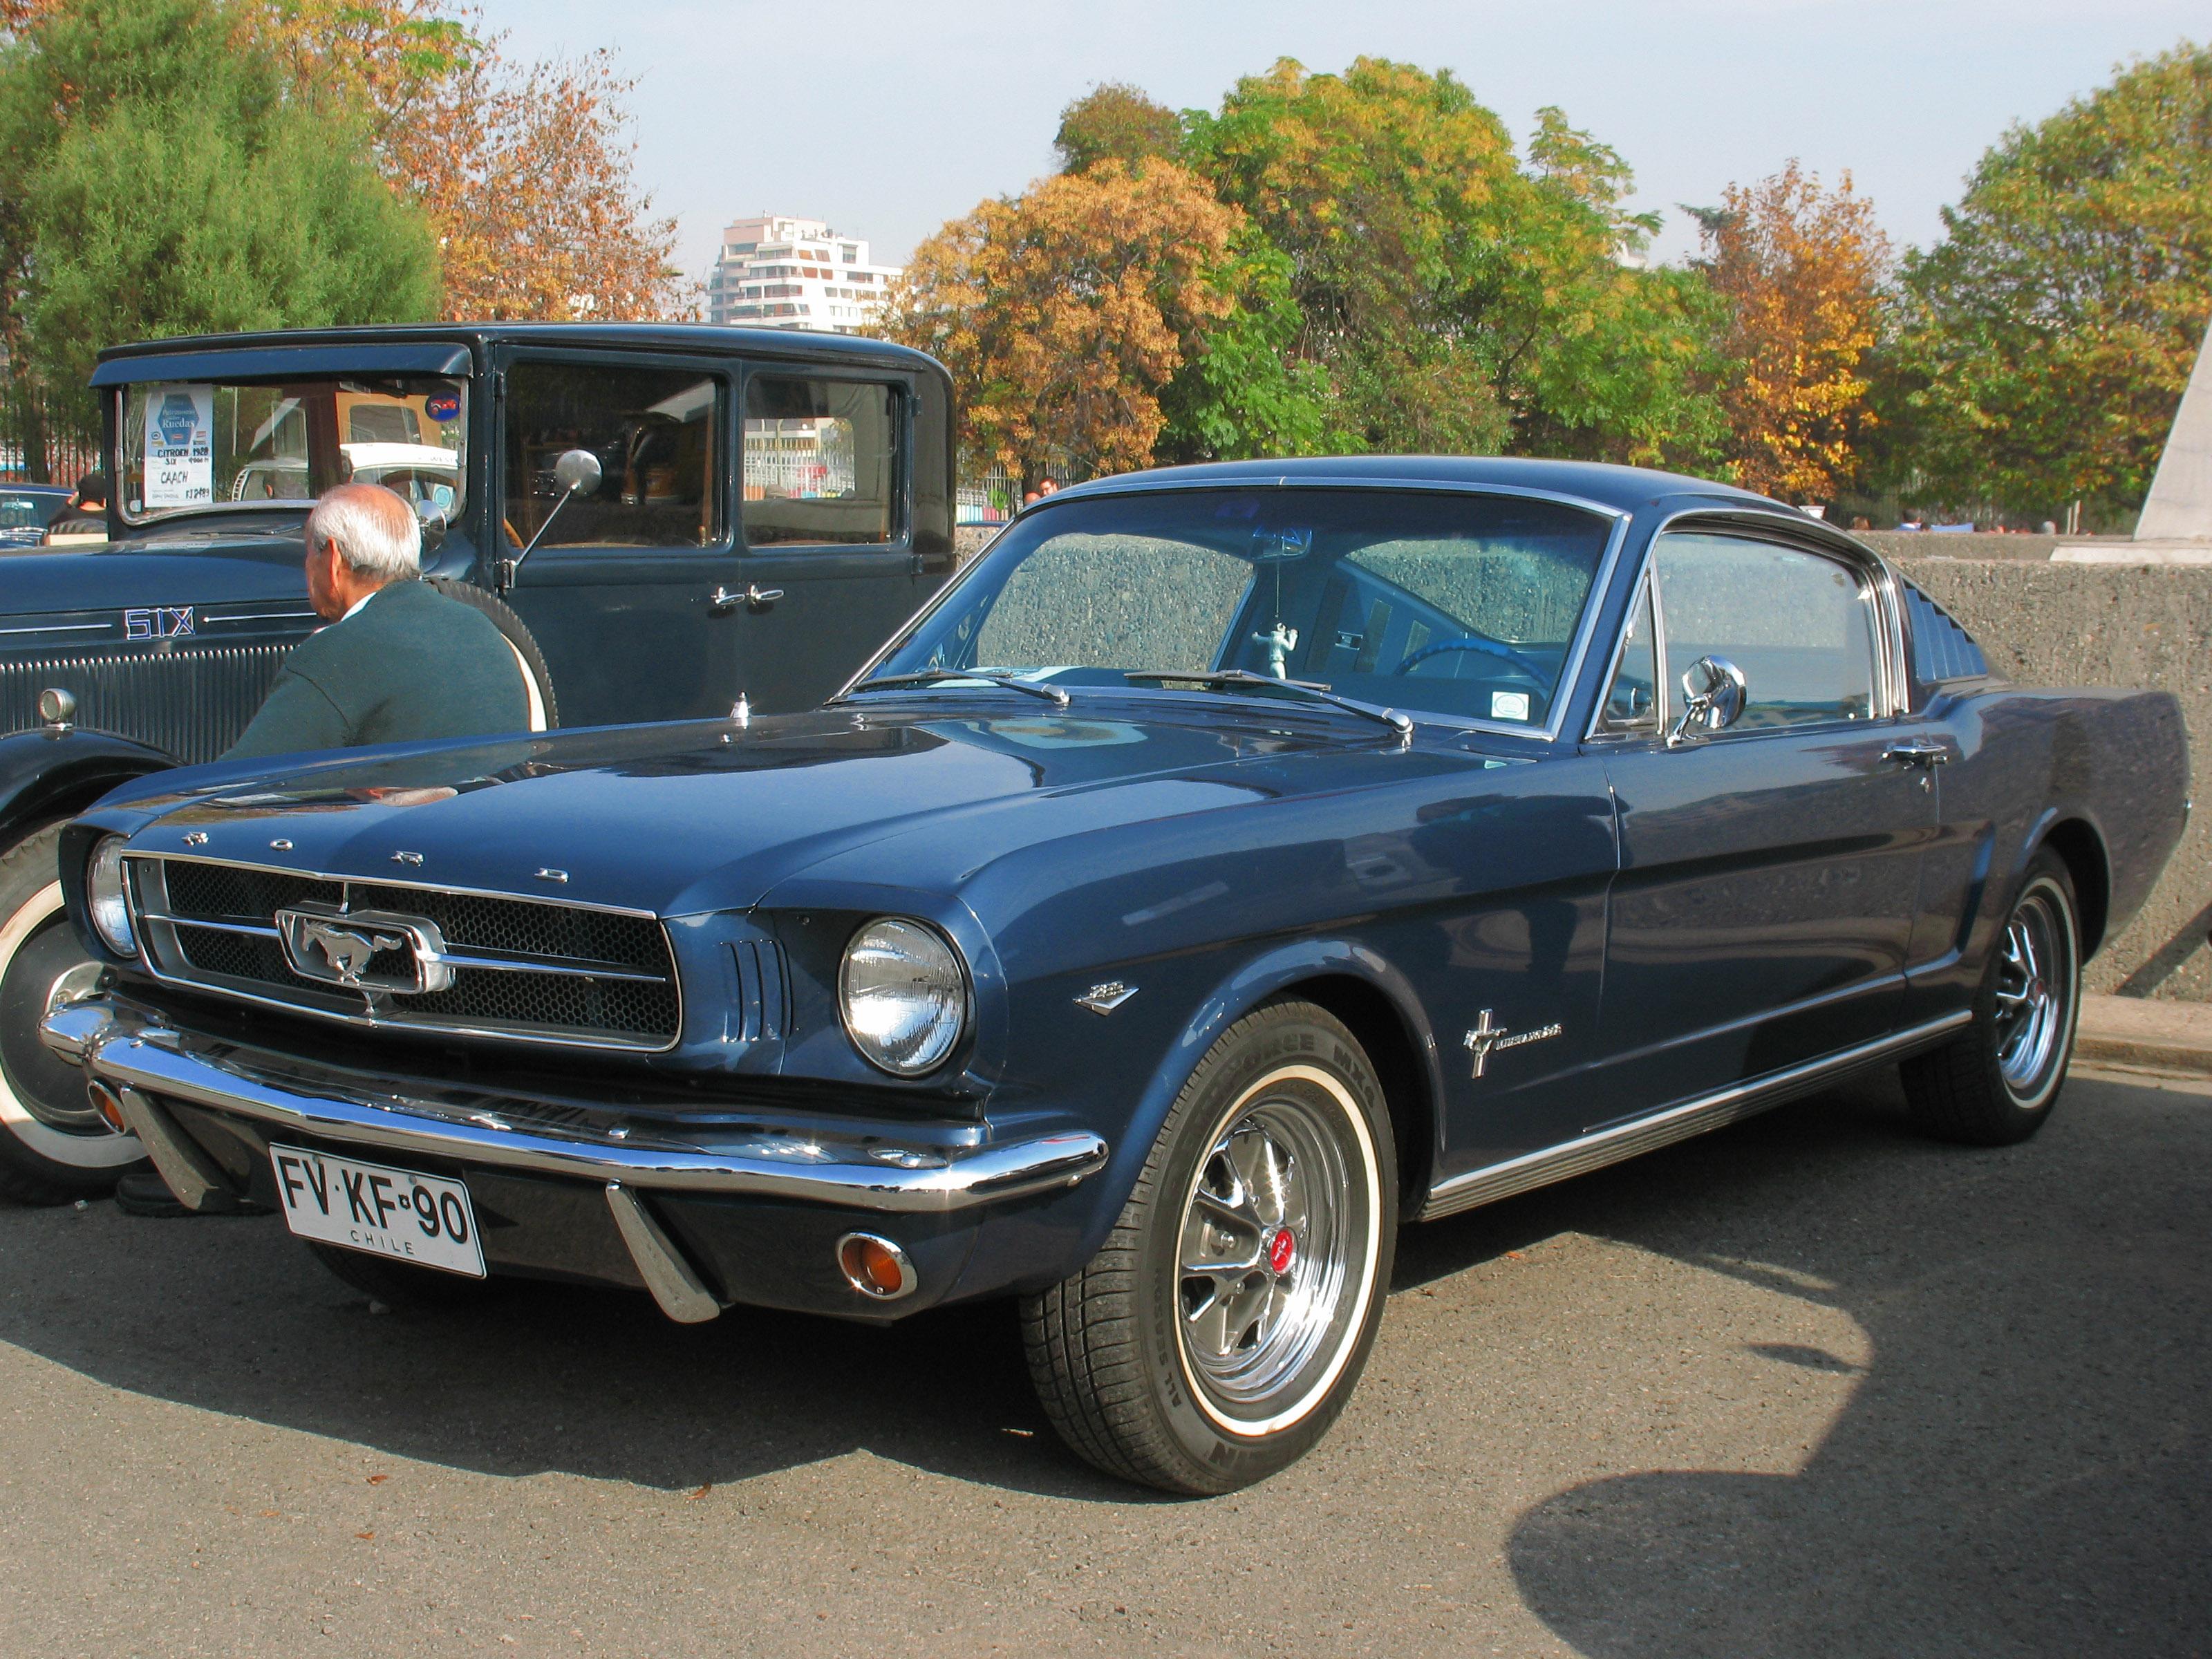 Fileford mustang 289 fastback 1965 14551258006 jpg